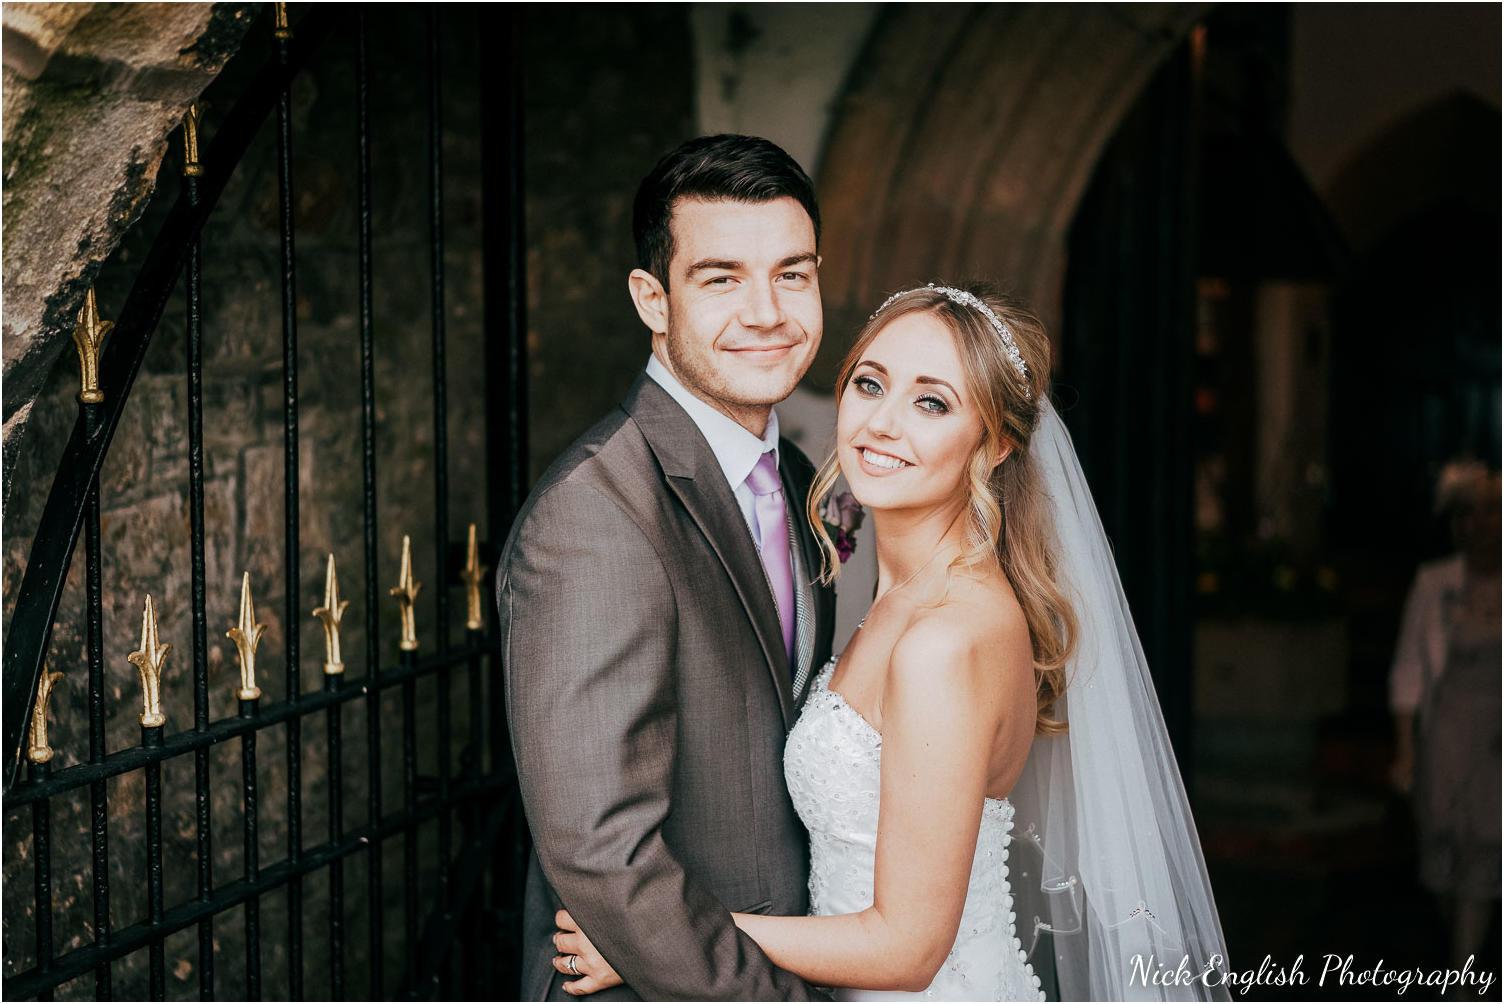 Mitton_Hall_Wedding_Photographer_2018-78.jpg